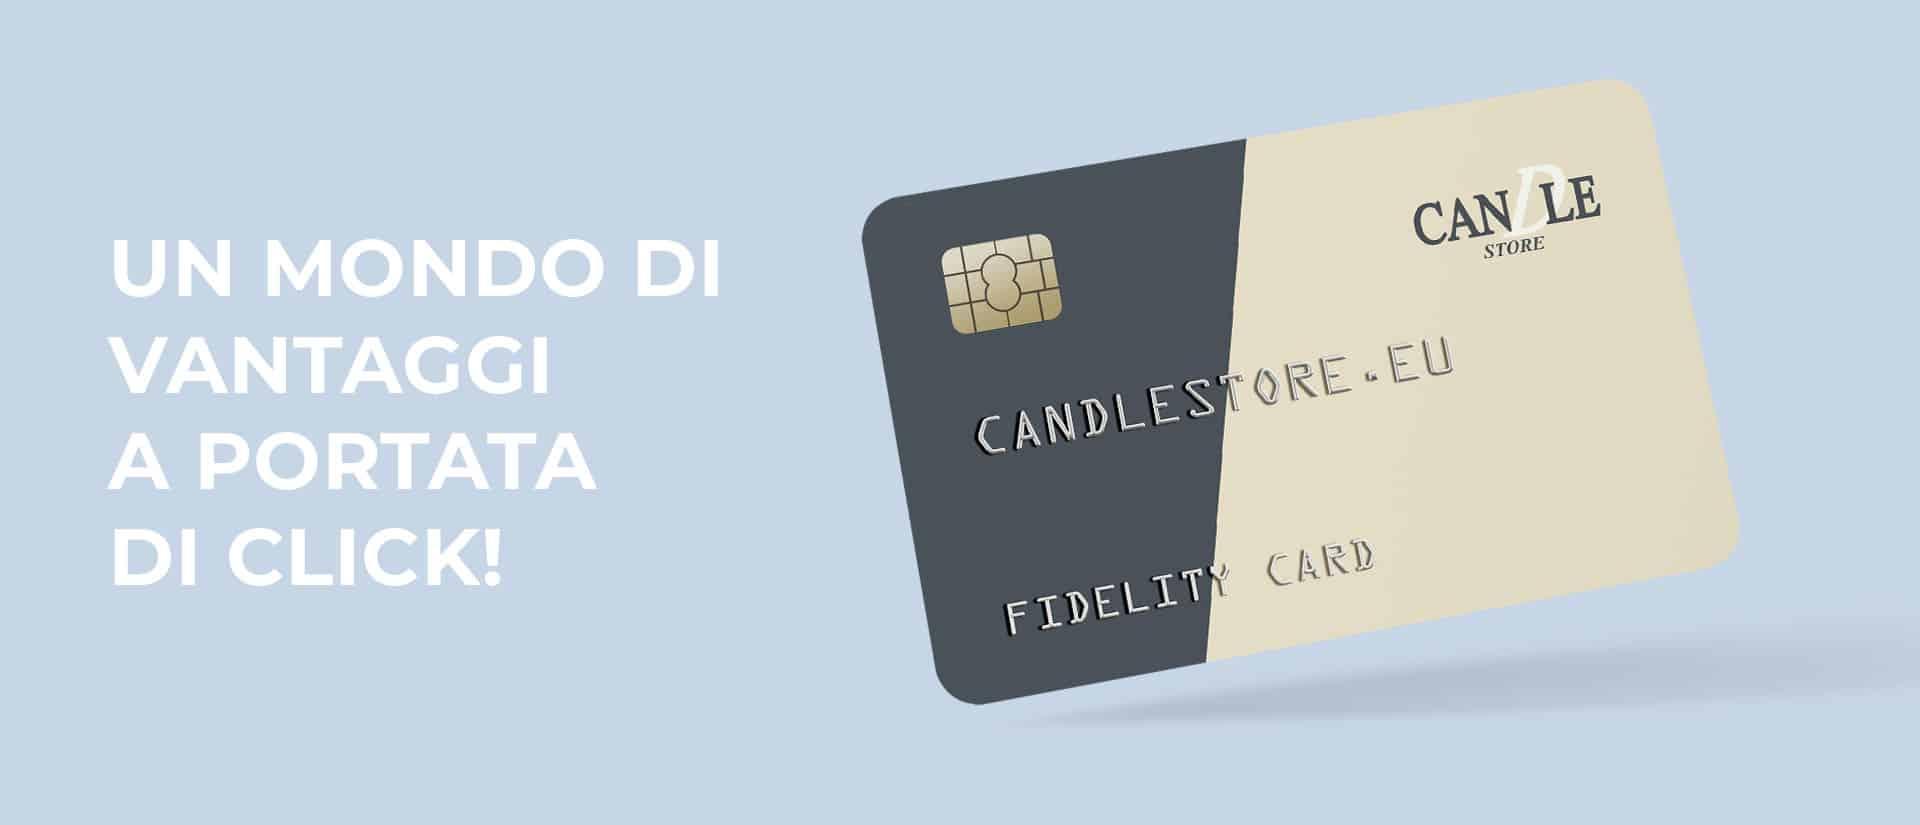 credit card mockup 02